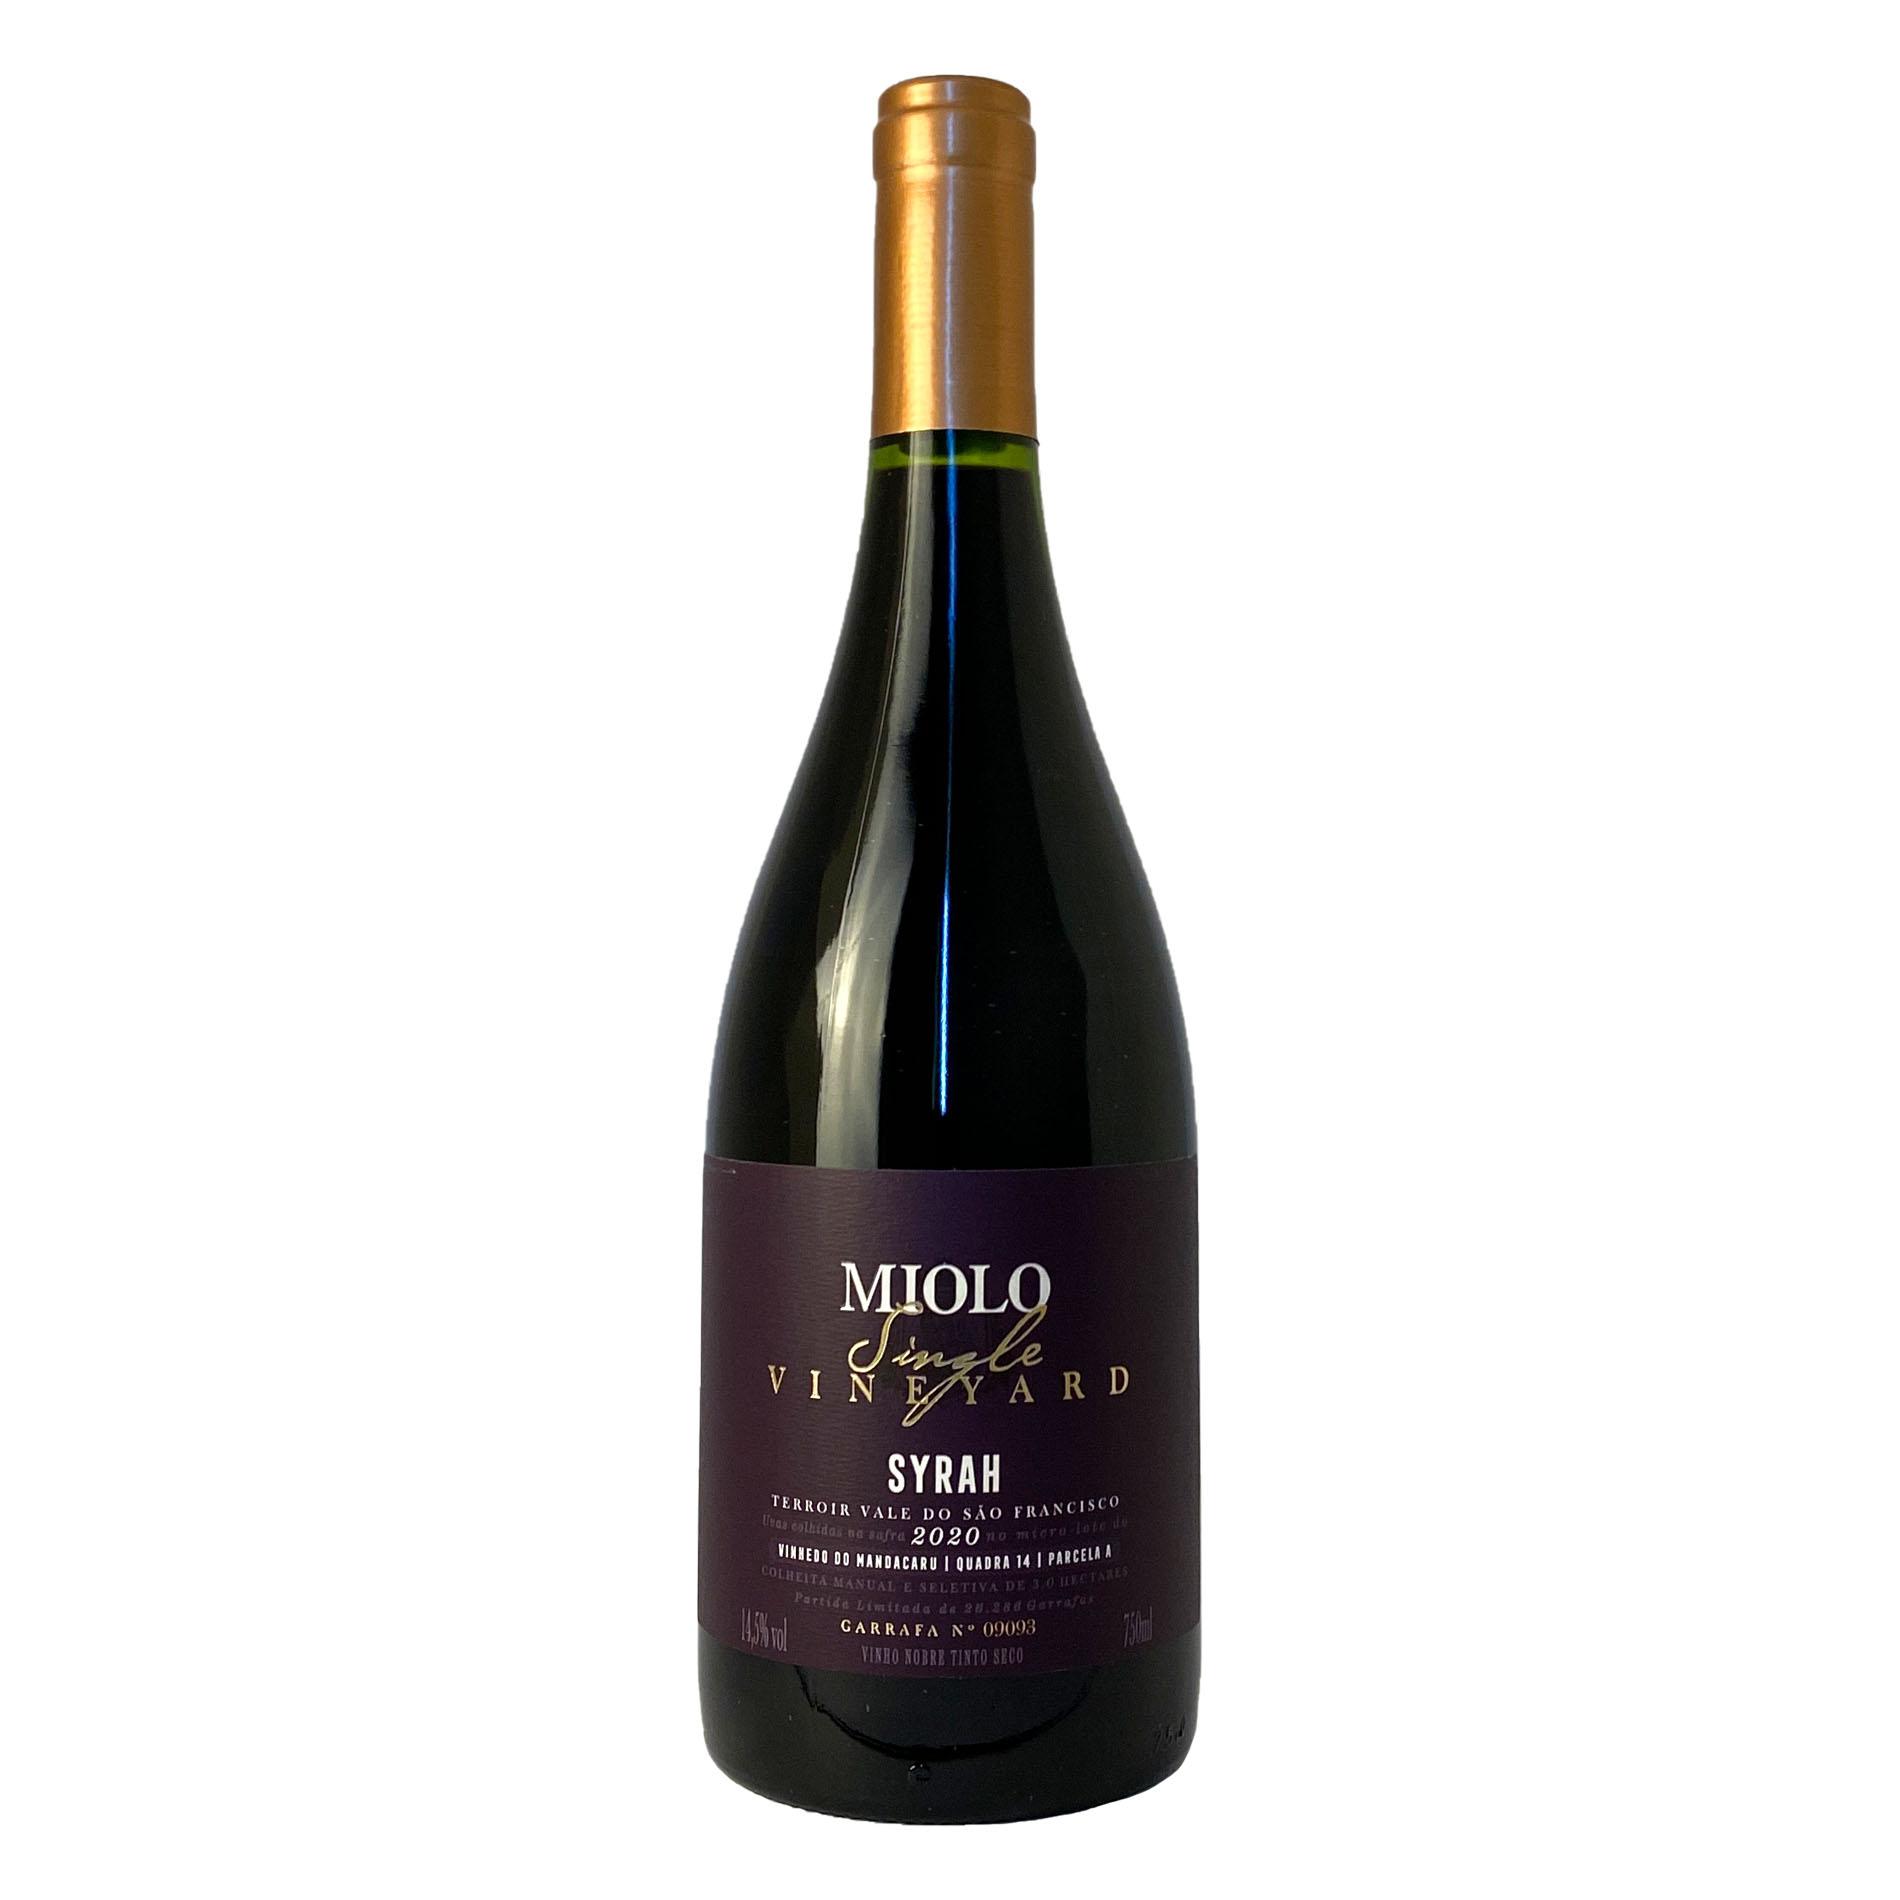 Miolo Single Vineyard Syrah  - Vinerize